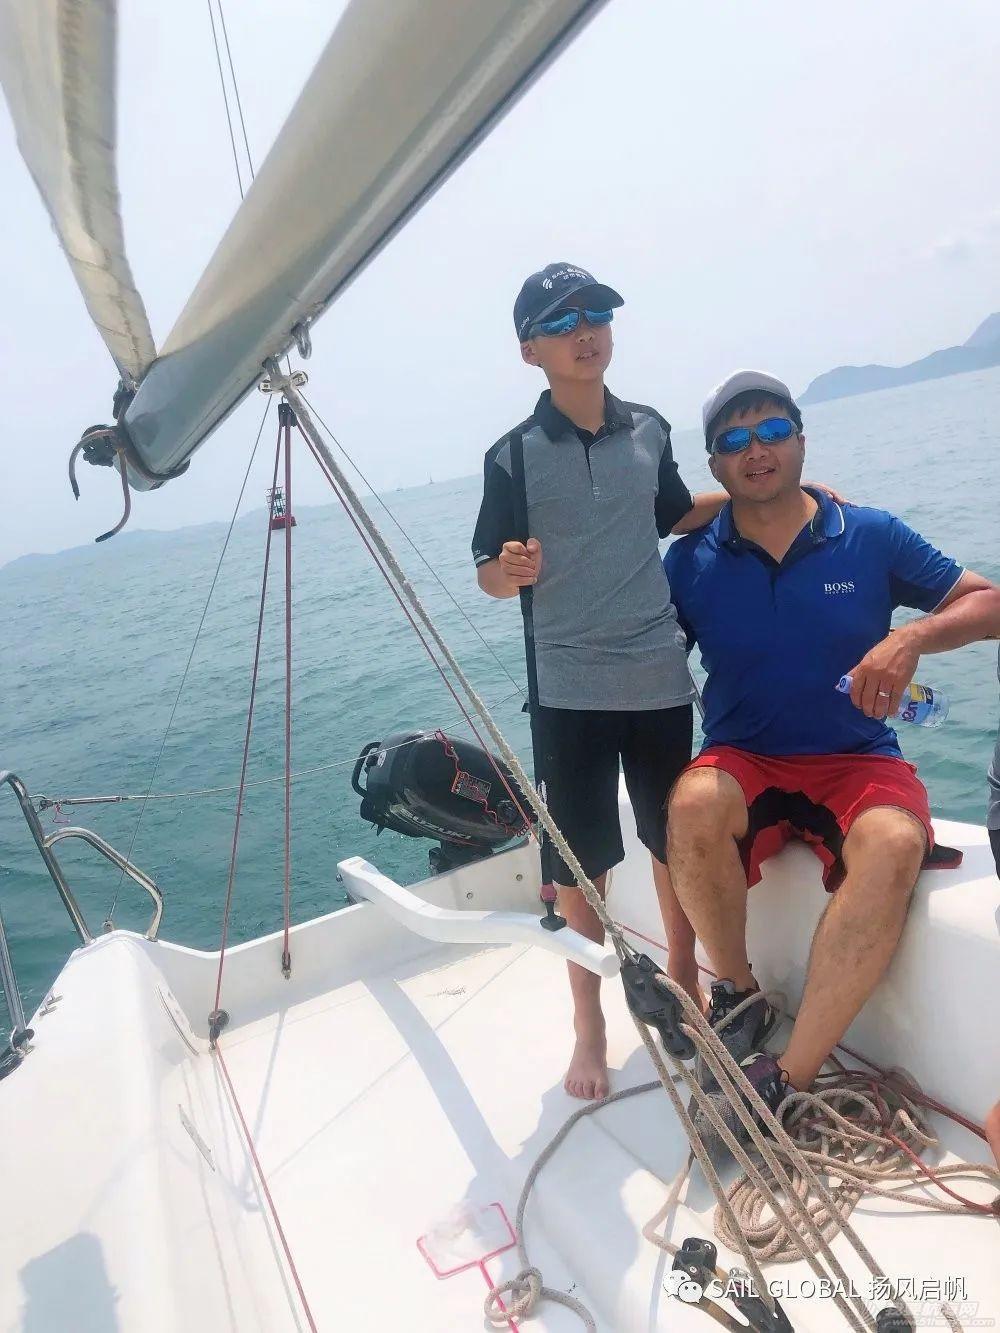 SAIL GLOBAL深圳亲子帆船课:扬帆逐梦,陪伴成长w6.jpg